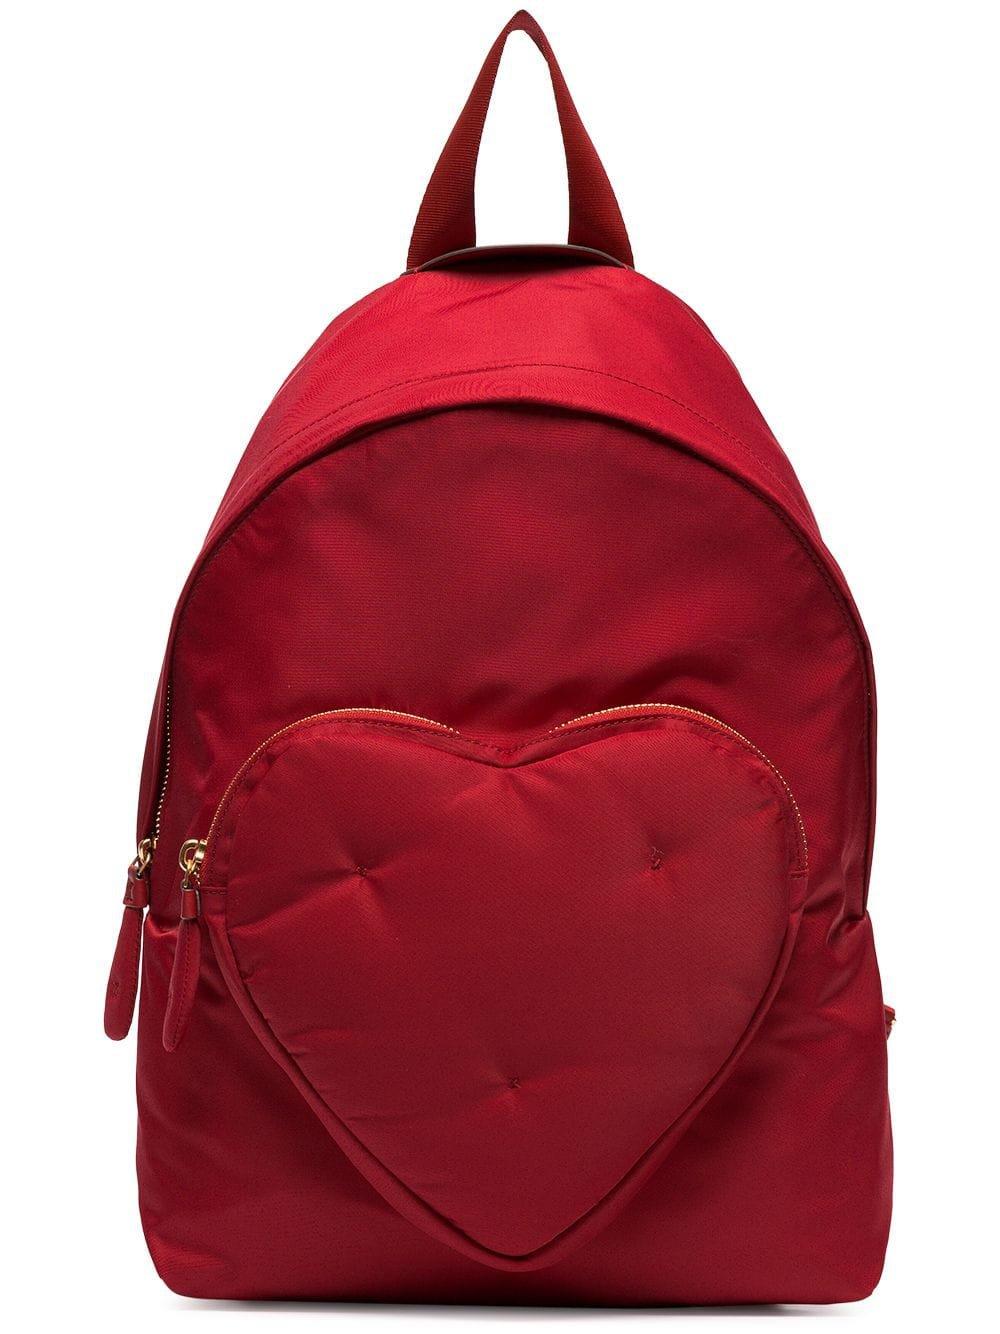 Anya Hindmarch red Chubby Heart nylon backpack £350 - Fast Global Shipping, Free Returns